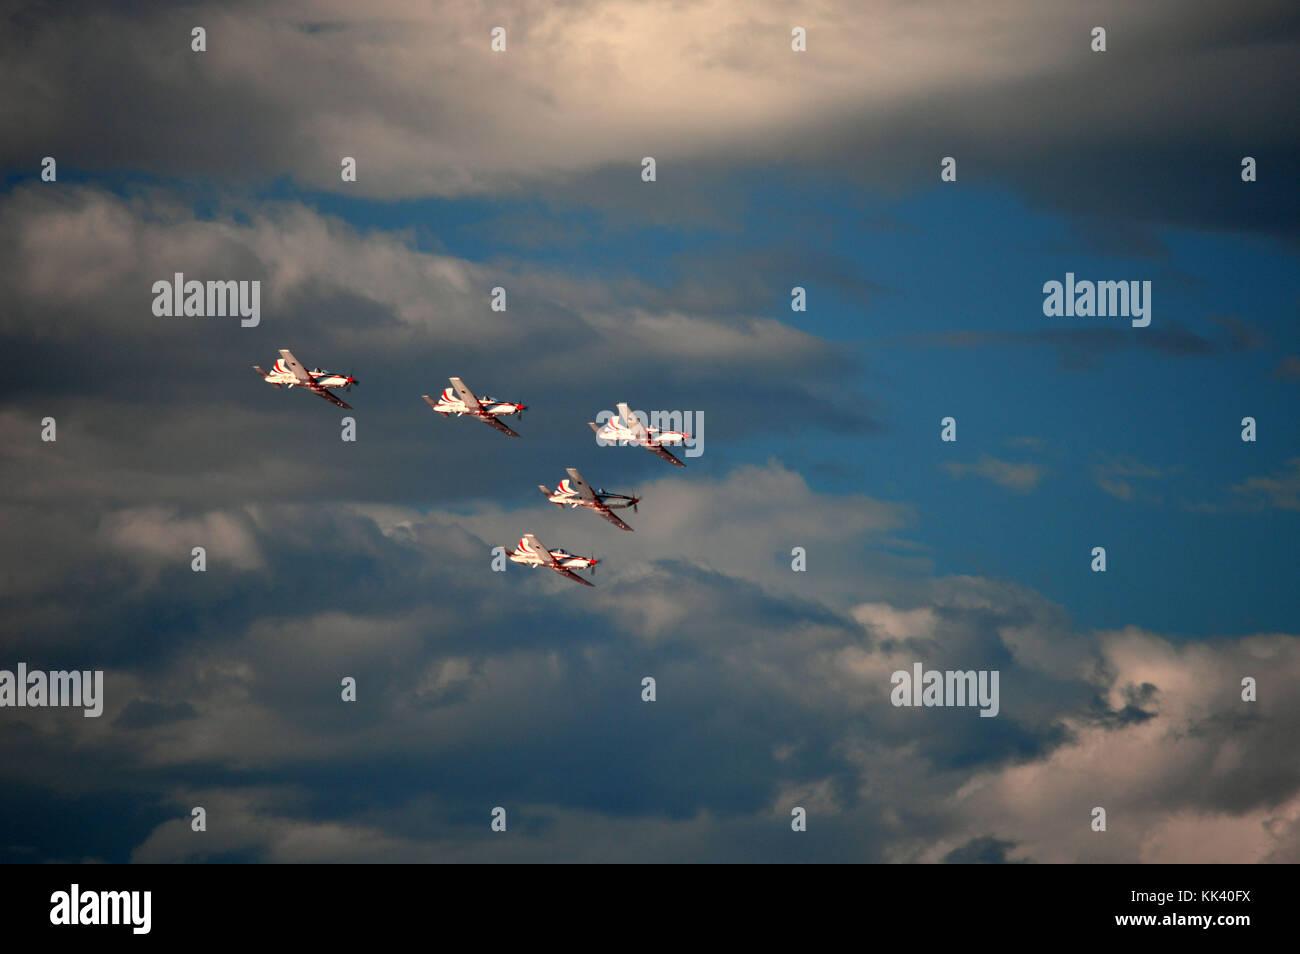 Croatian AF aerobatic team Krila Oluje (Wings of Storm) in a formation over Šibenik Croatia Stock Photo